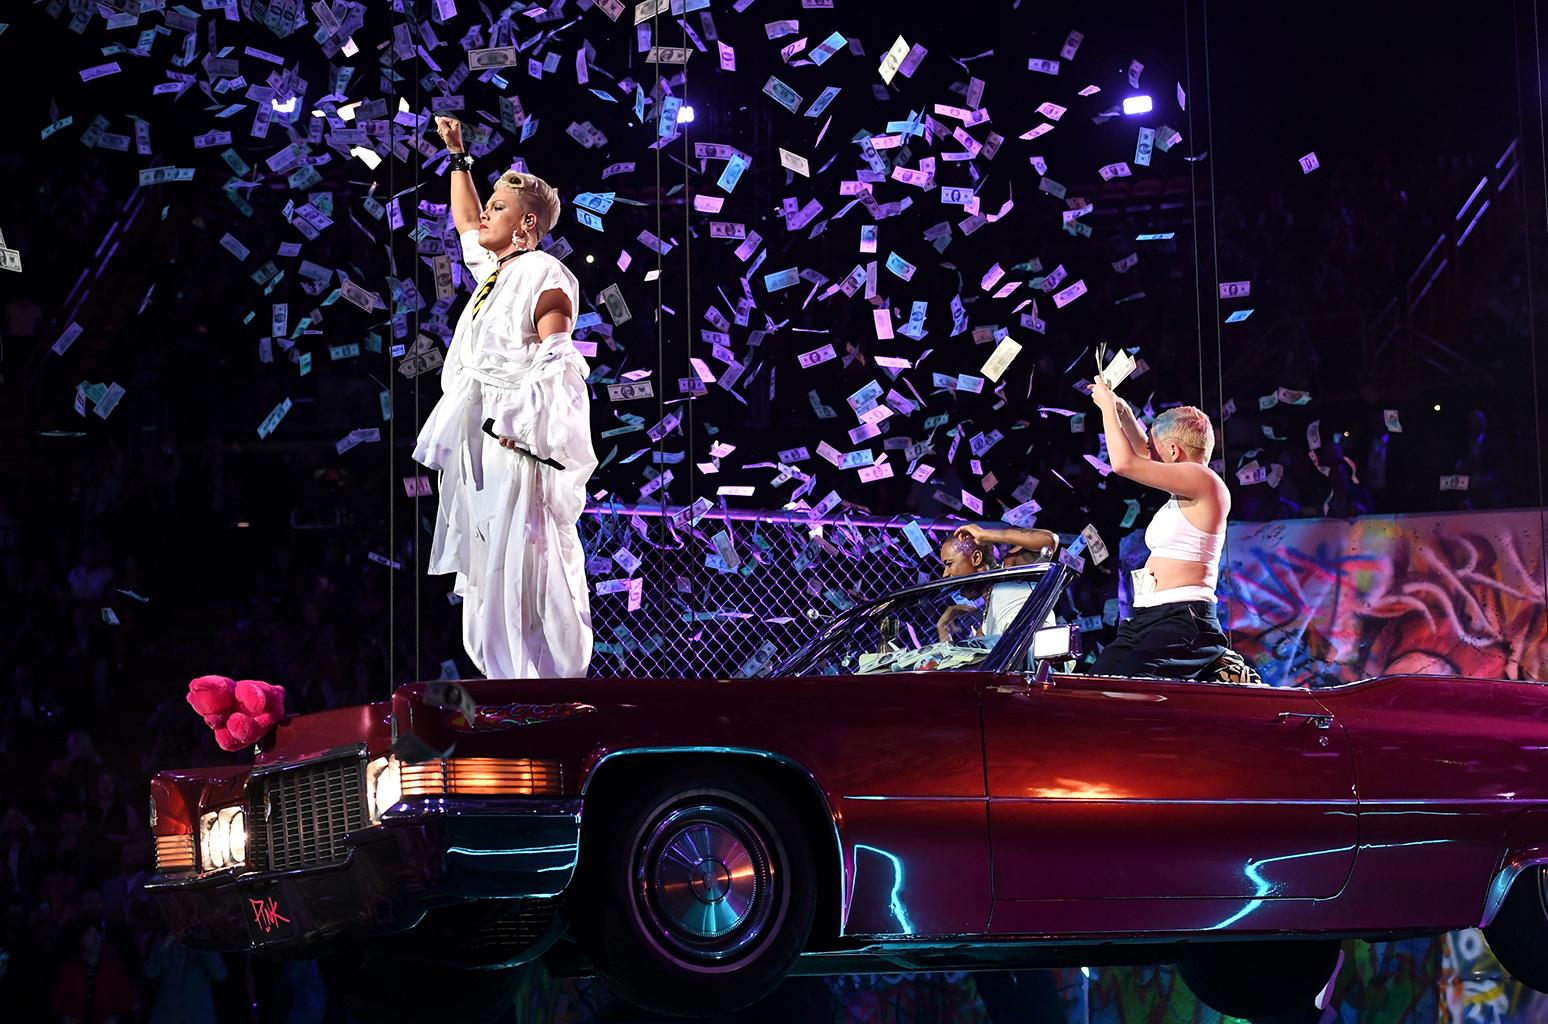 2017 Cadillac Deville >> Pink Cruises at the VMAs atop a Pink Cadillac and Receives